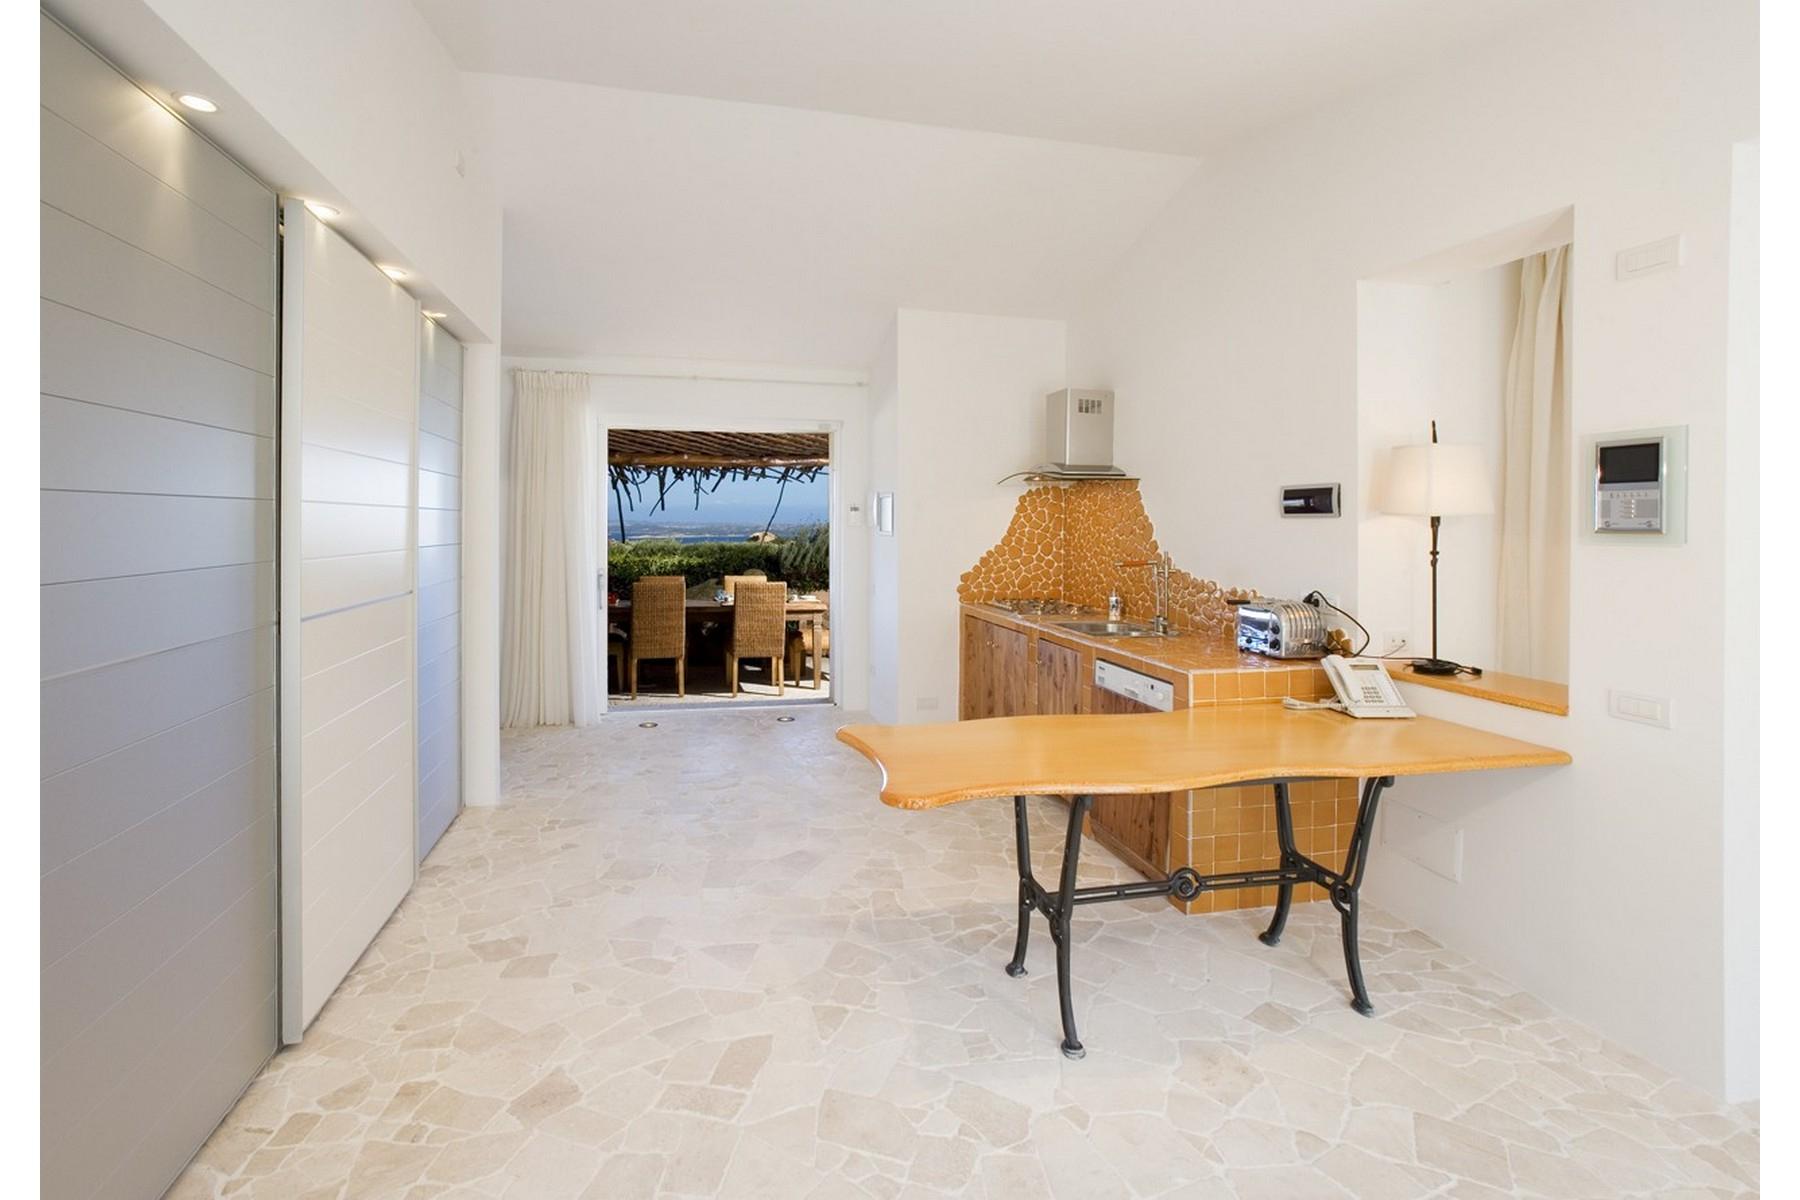 Additional photo for property listing at Liscia di Vacca Superb detached villa in Liscia di Vacca Other Sassari, Sassari Italy